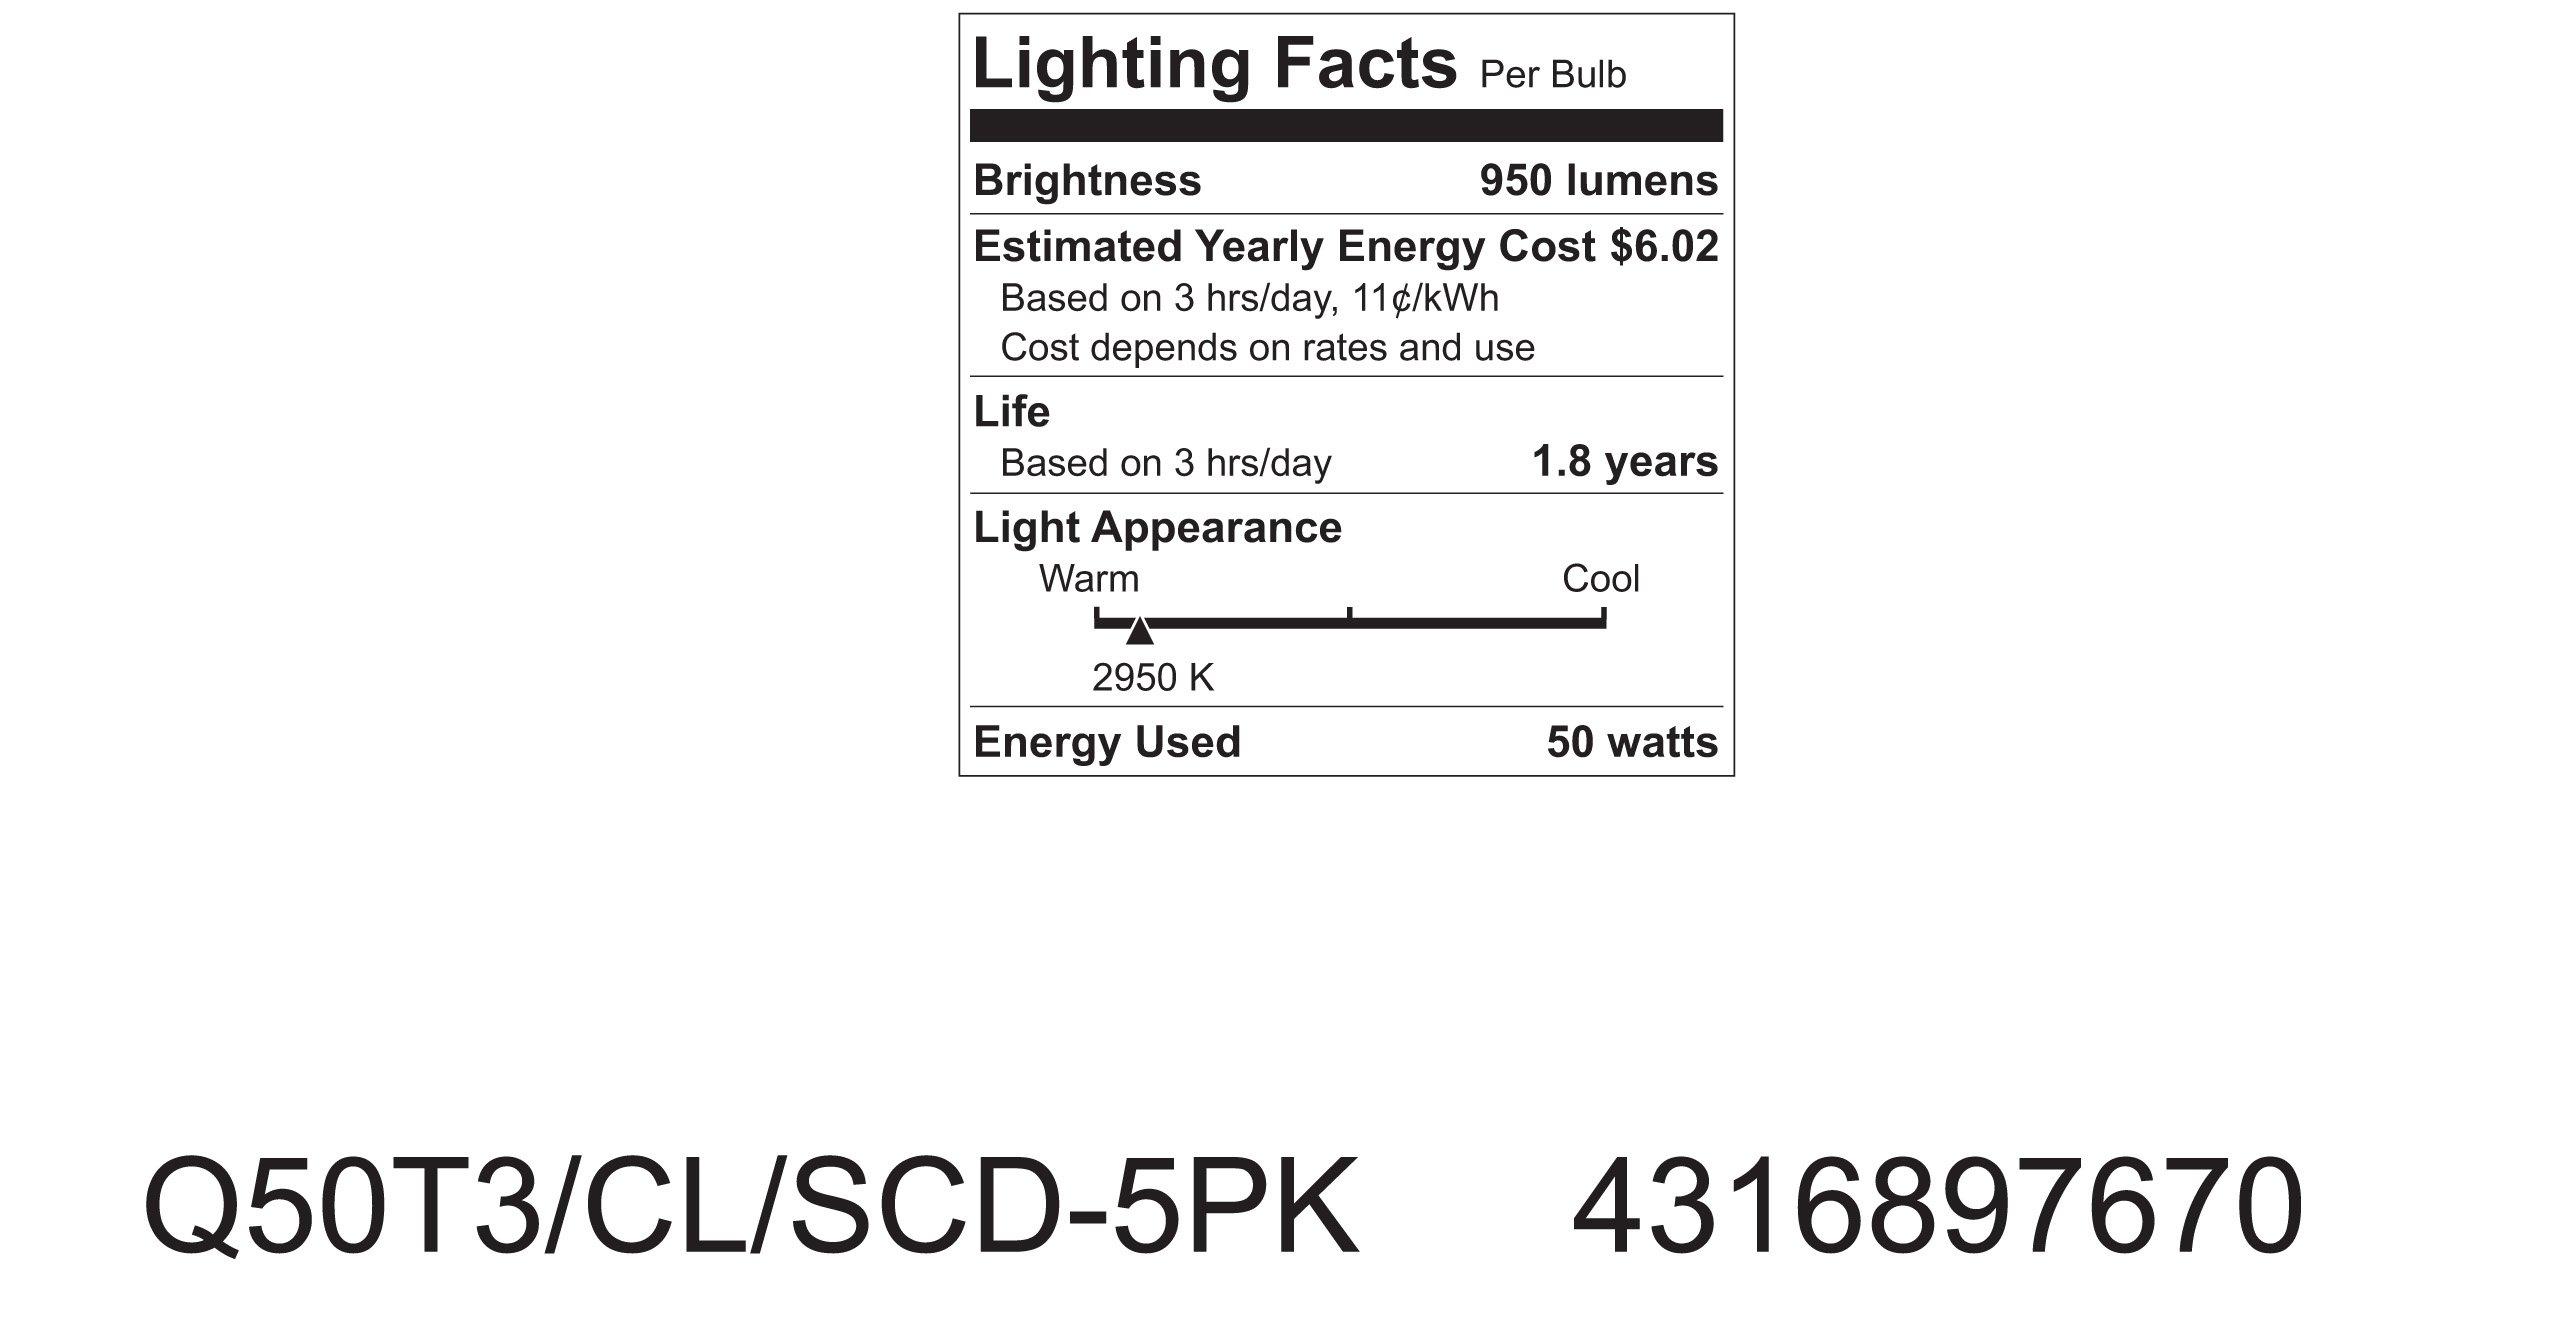 GE Lighting Halogen 97670 50-Watt, 950-Lumen T3 Light Bulb with 2-Pin (GY6.35) Base, 1-Pack